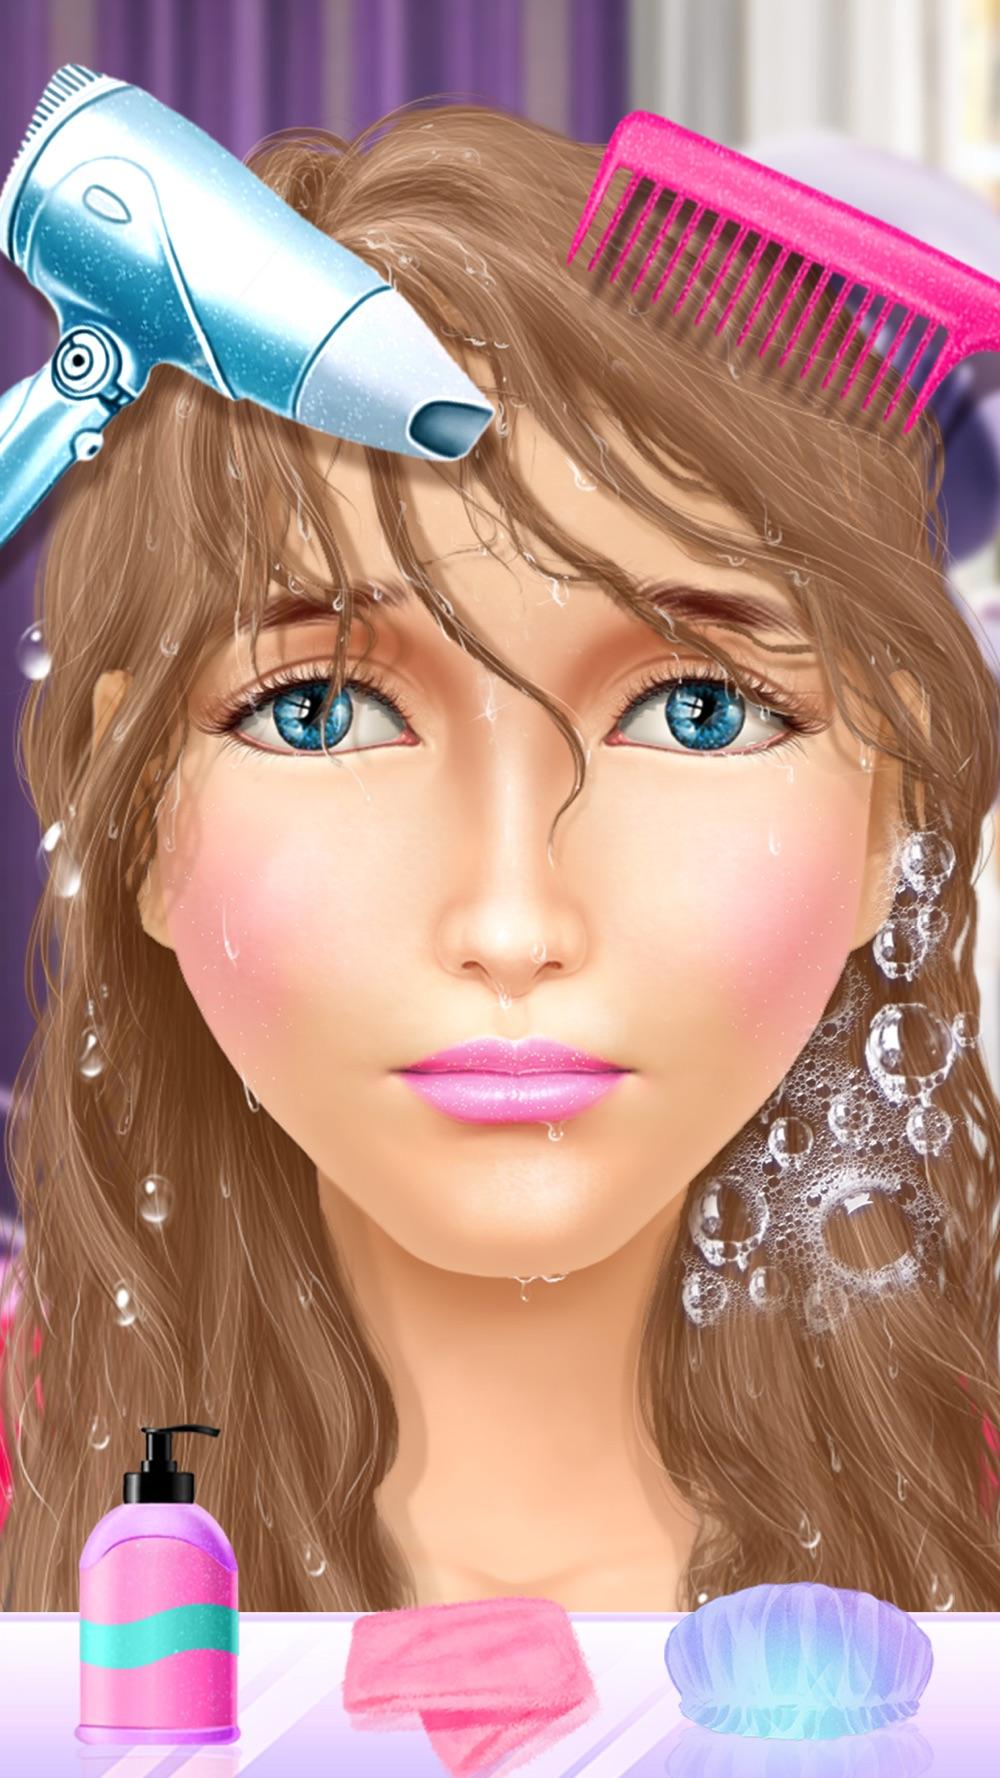 Princess HAIR Salon – Beauty Makeover! Cheat Codes